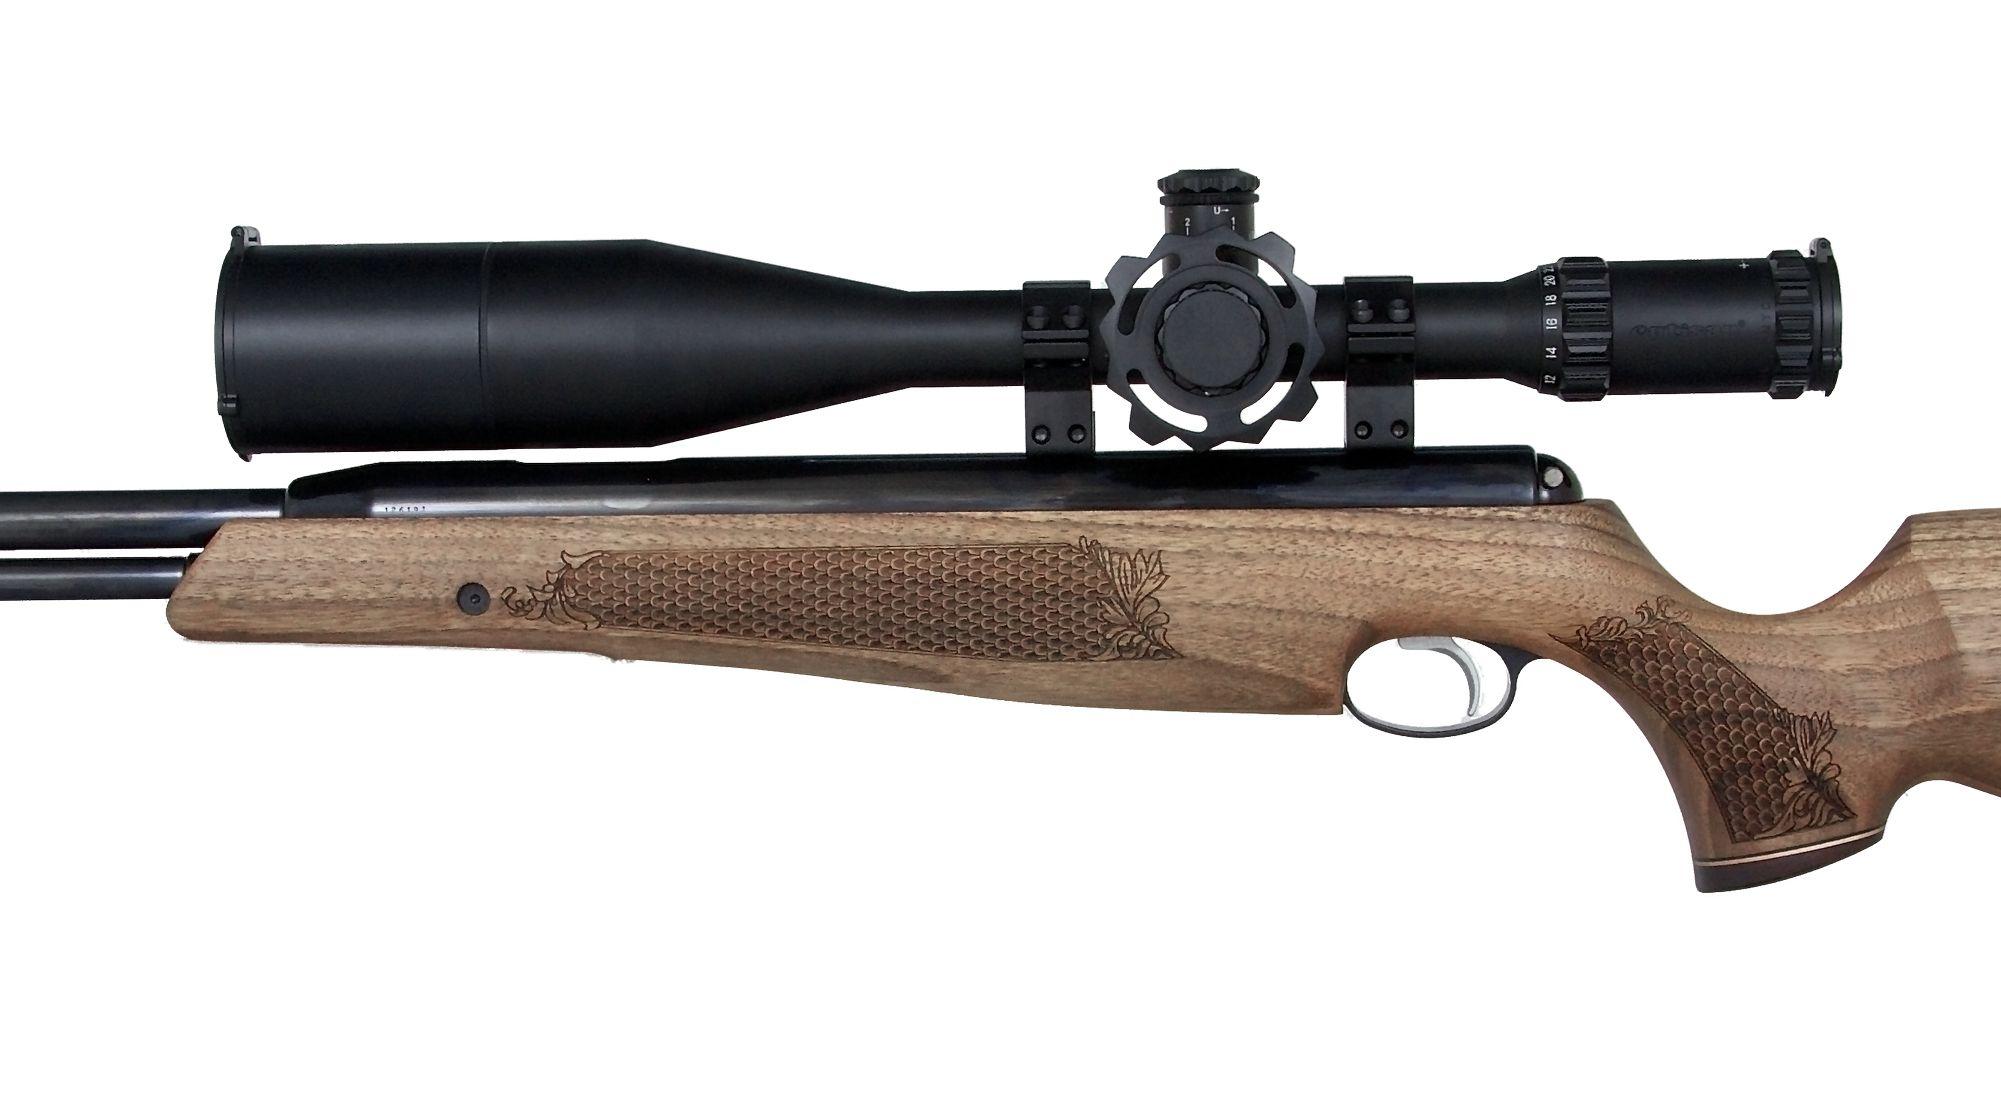 A famous Air Arms TX200 wearing an Optisan Viper 3-12x44